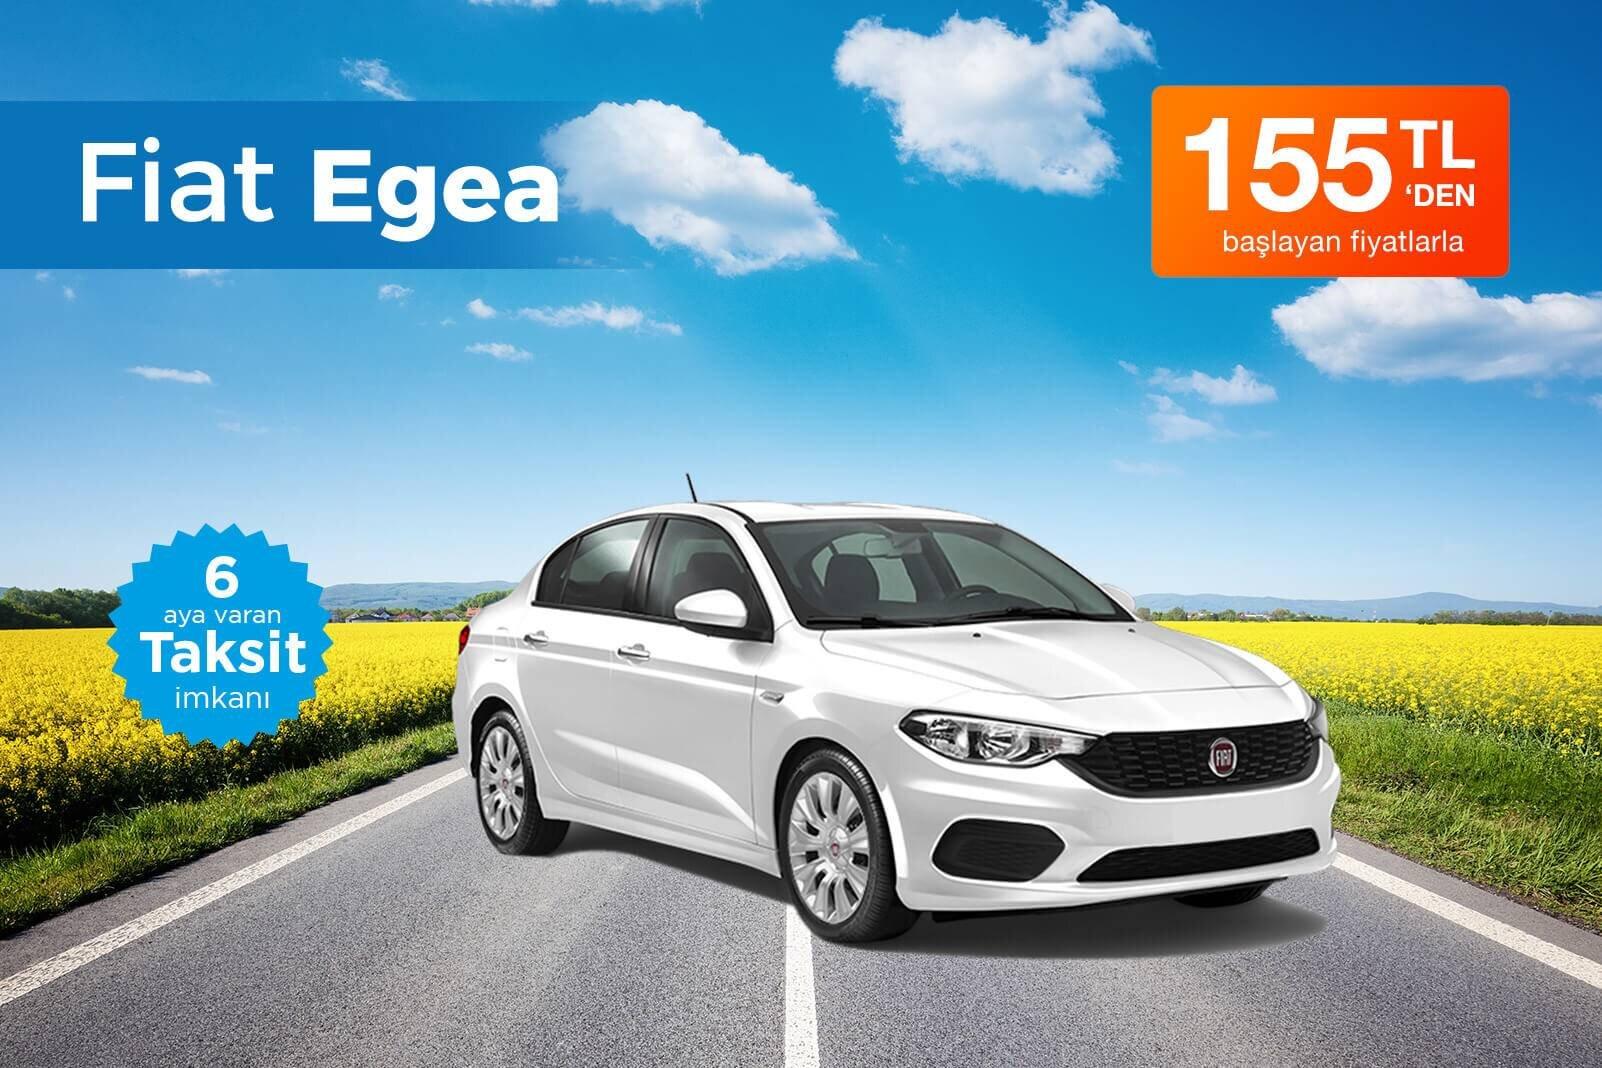 Fiat Egea Kiralama Fırsatı